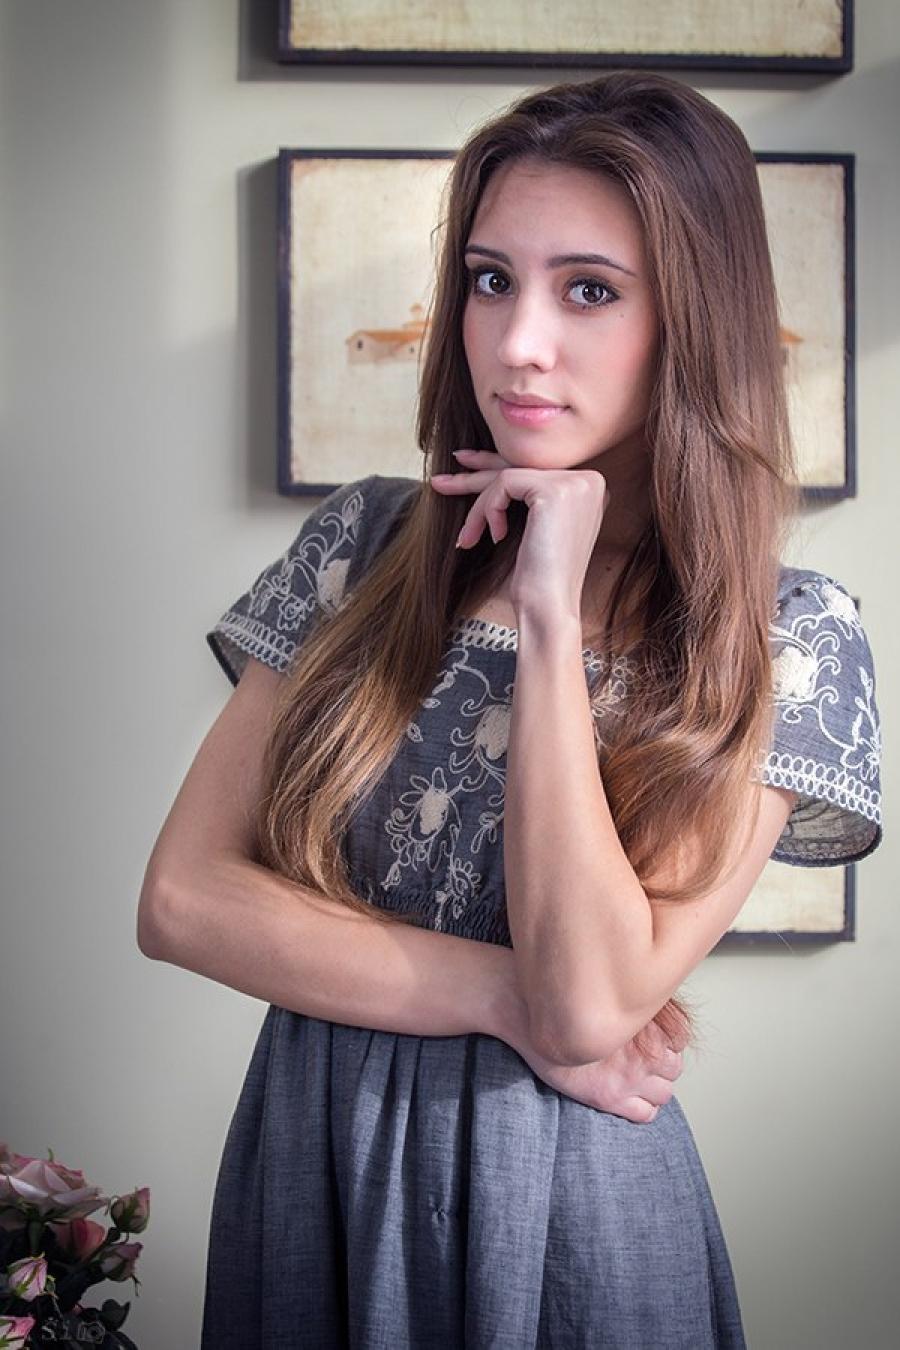 Фото девушки из чебоксары